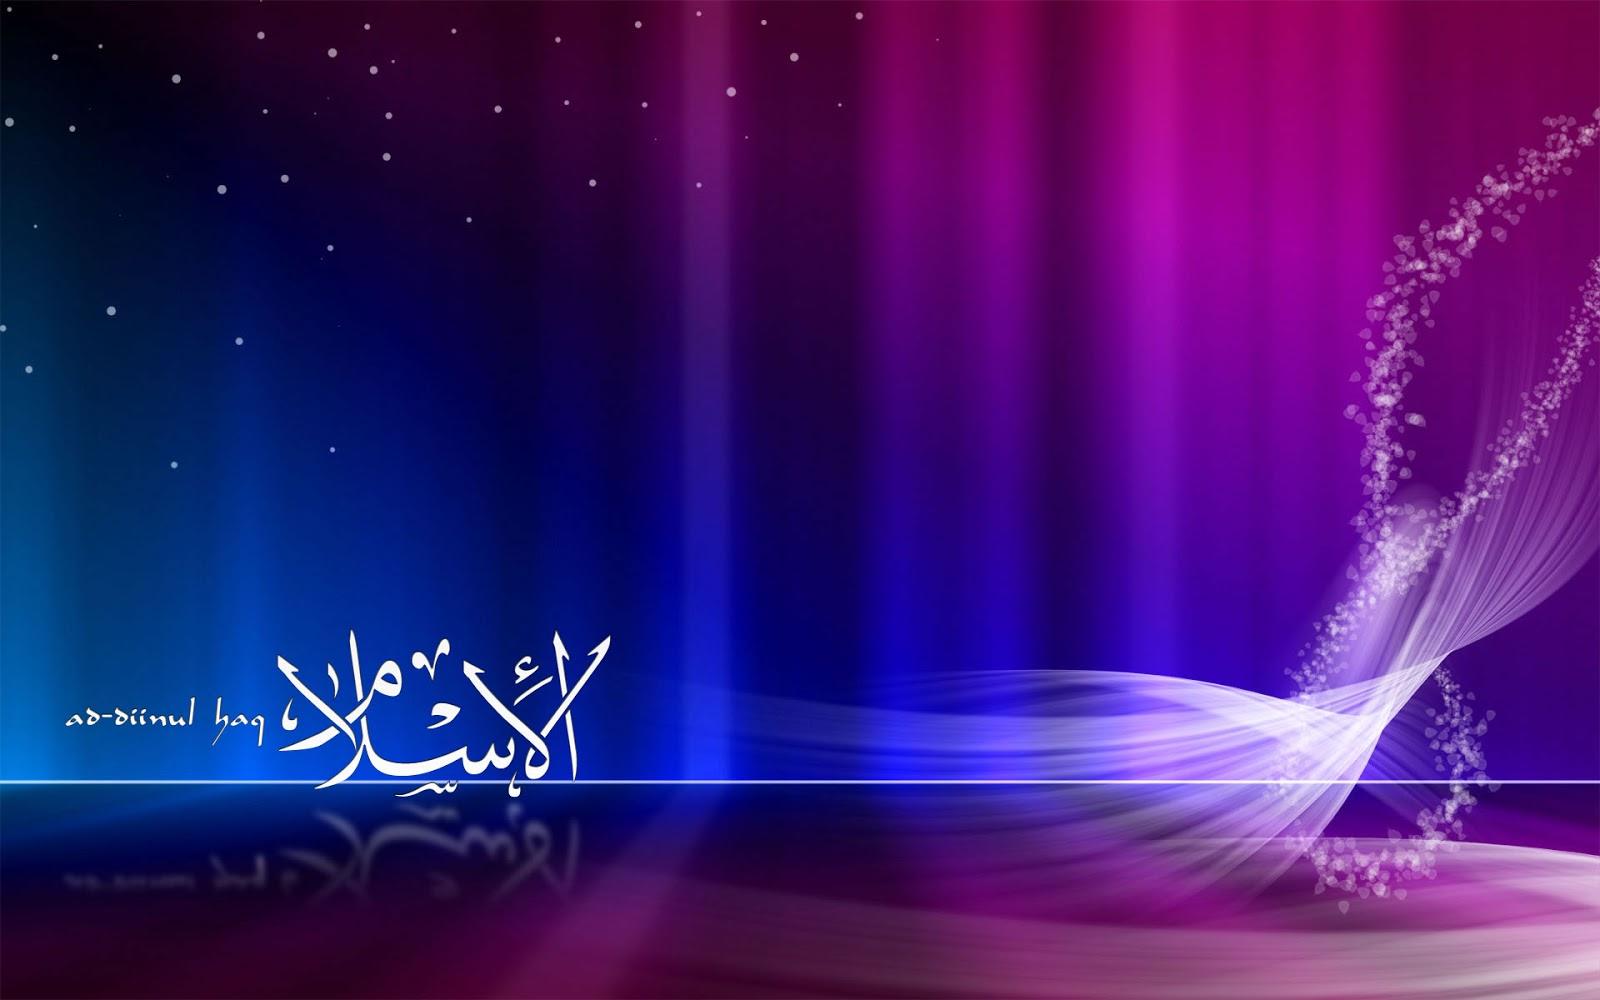 Gambar-gambar Wallpaper Islam Muslim Dan Indah